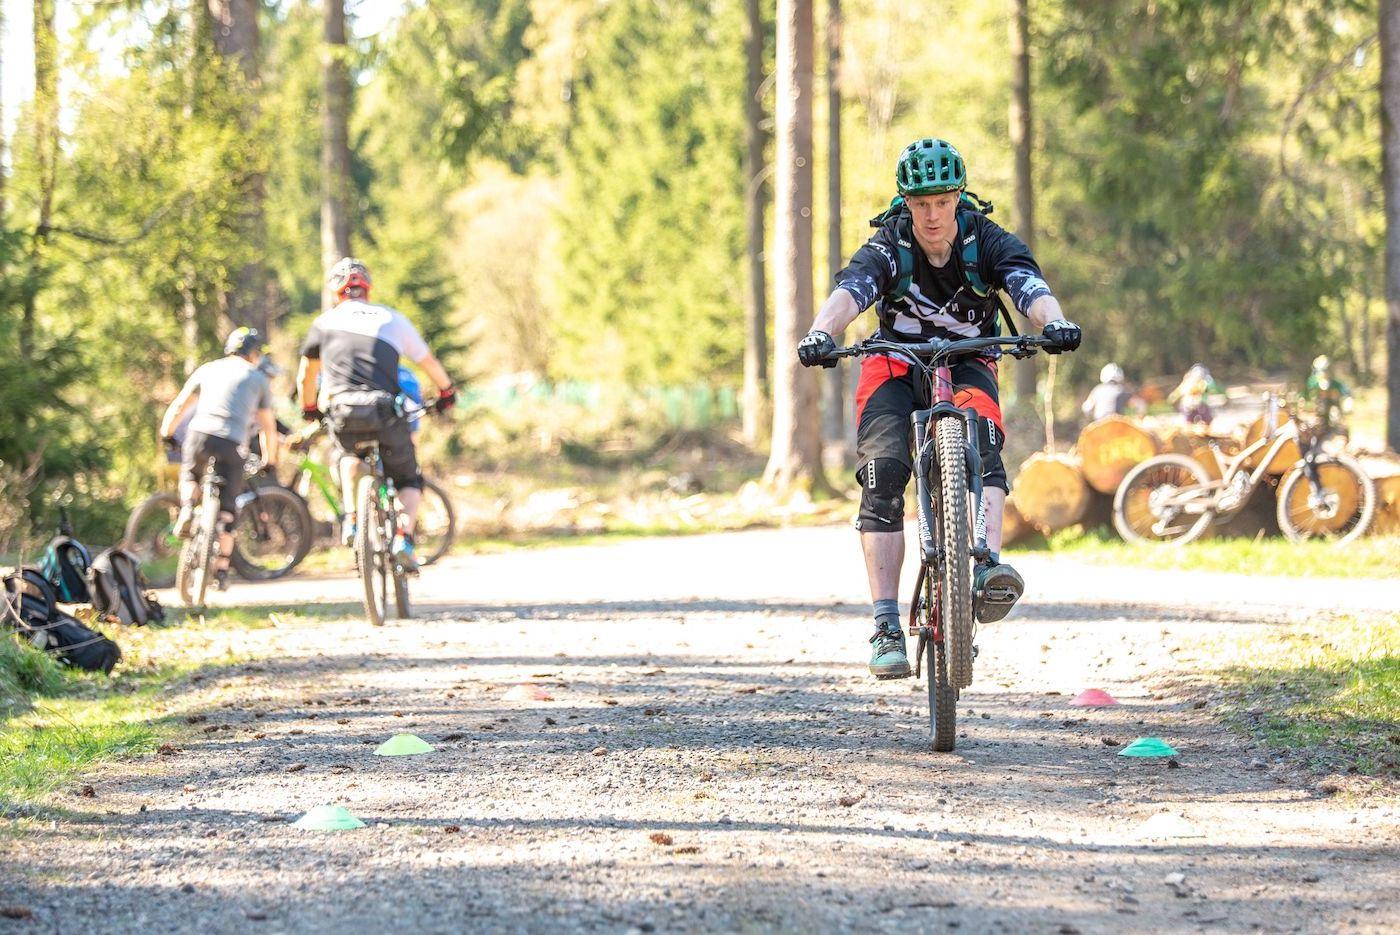 MTB Fahrtechnik Kurs Fortgeschrittene in Frankfurt  Taunus - Mountainbike Fortgeschritten - Rock my Trail Bikeschule